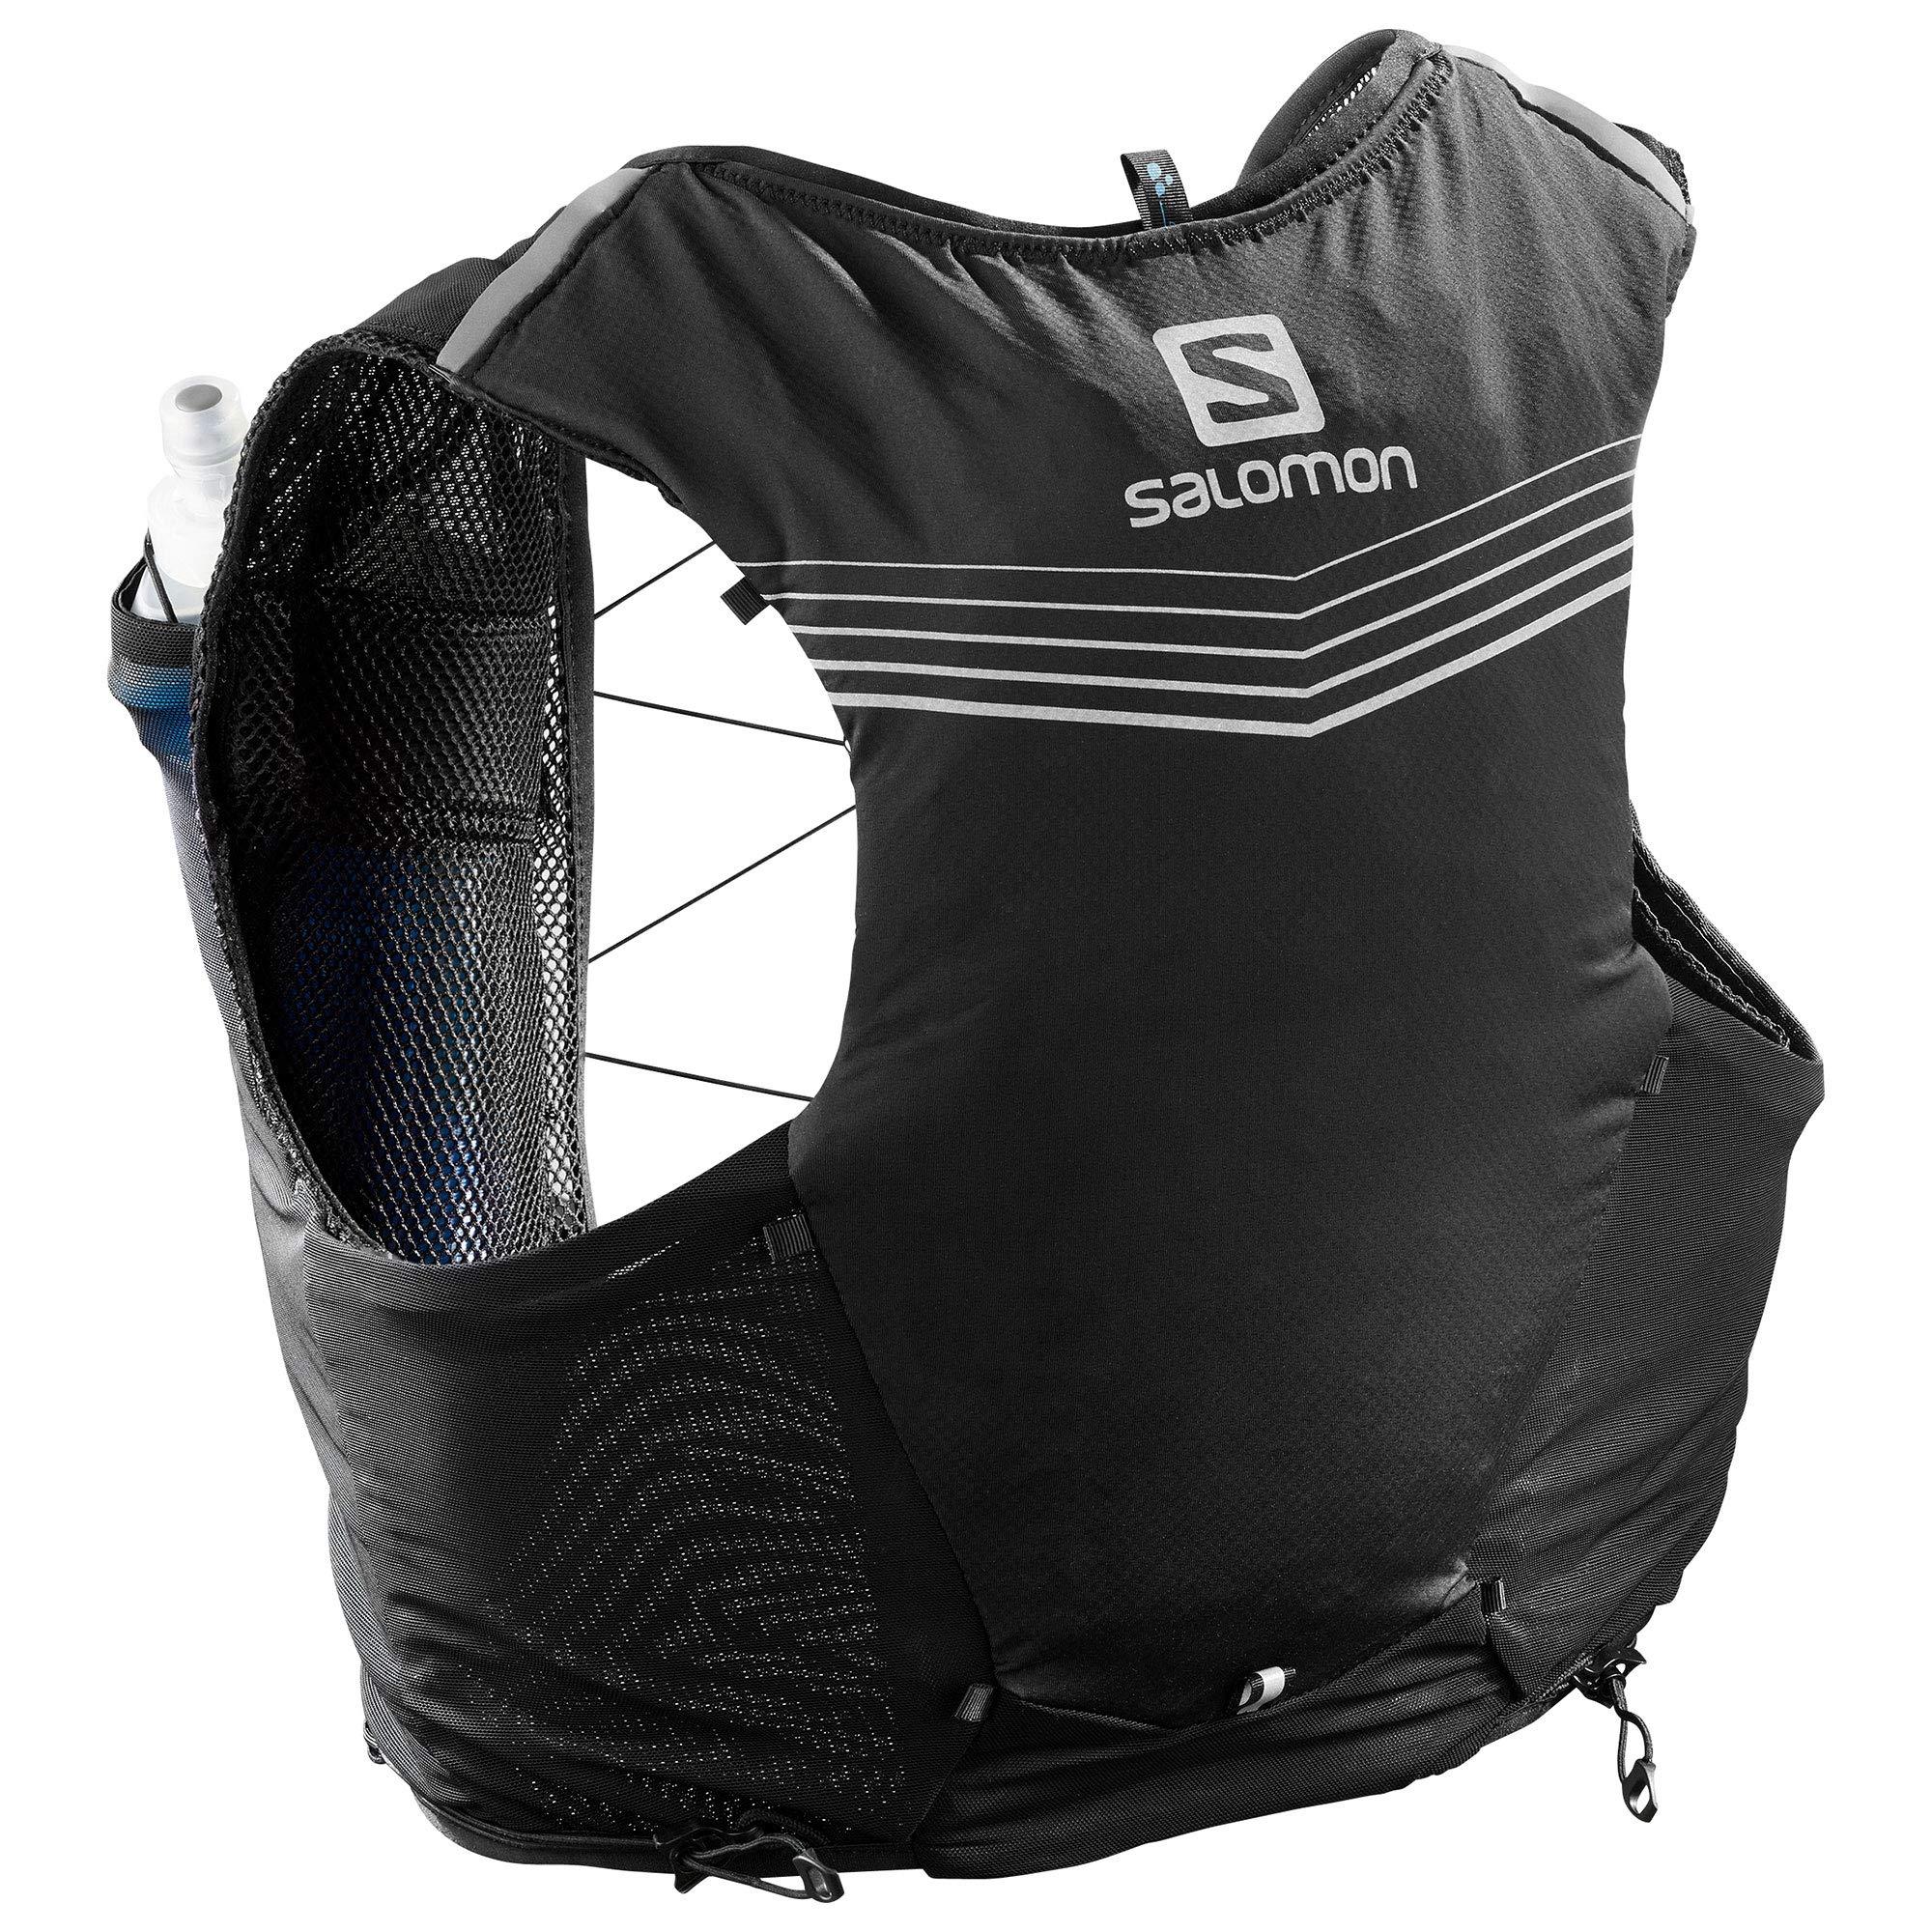 Salomon Unisex Adv Skin 5 Set Black X-Large